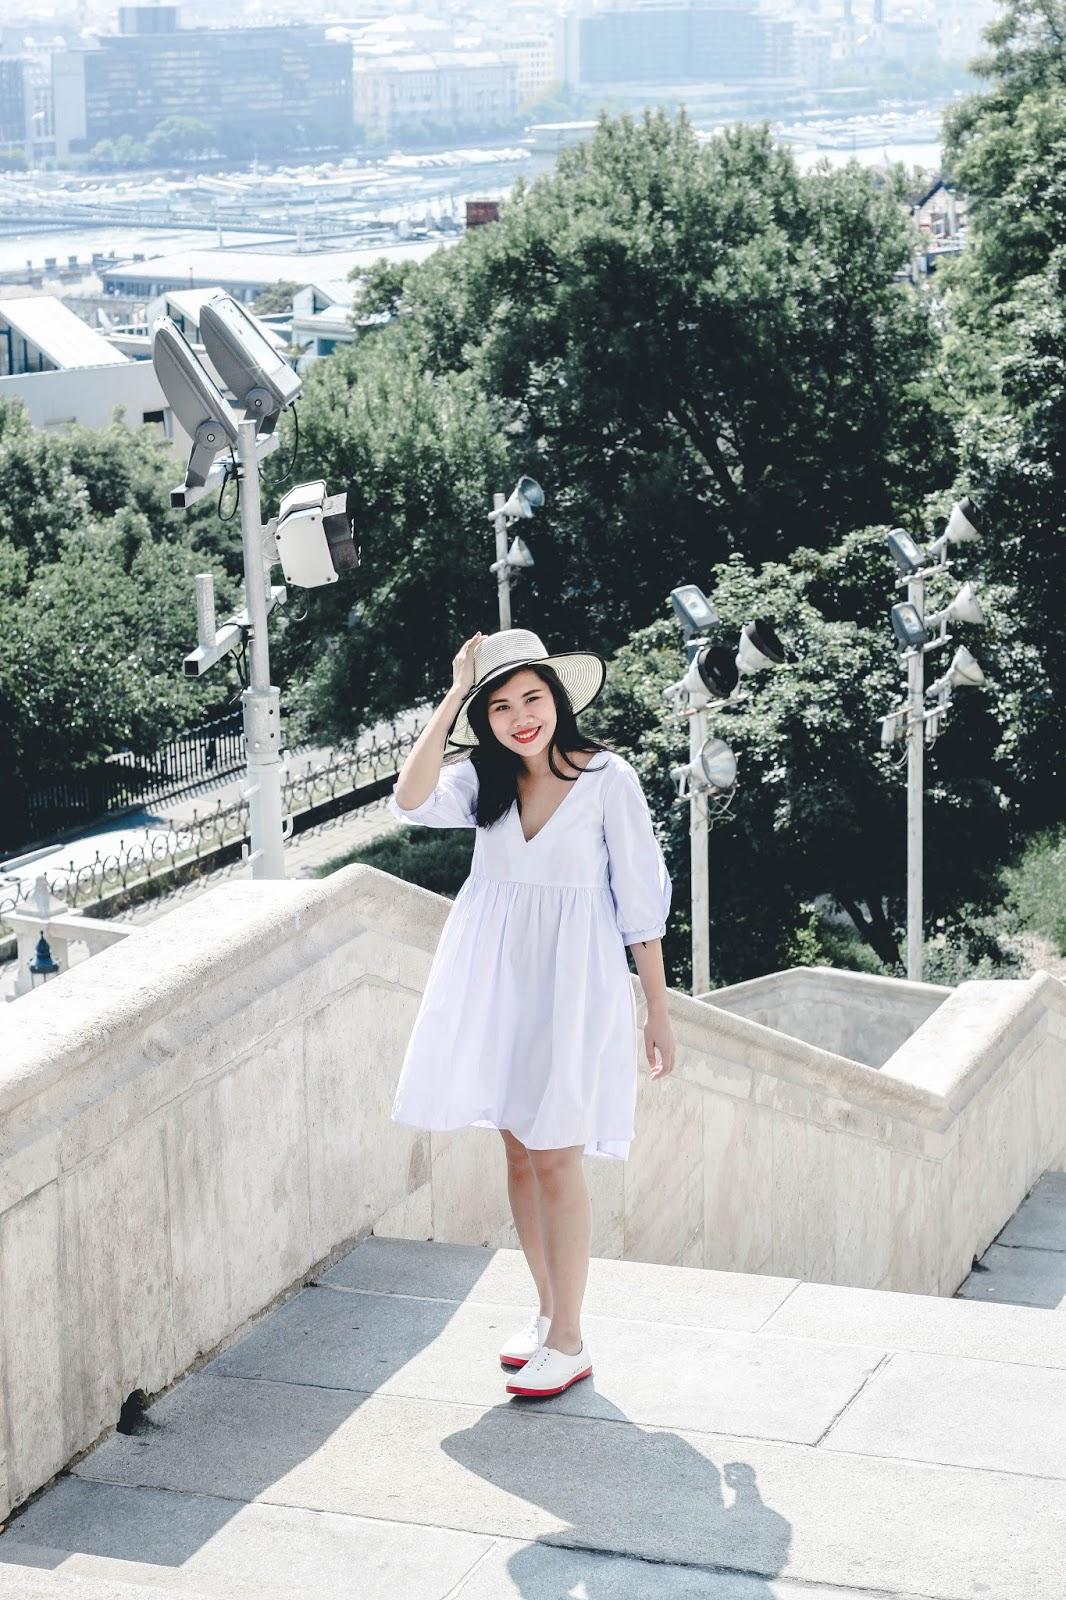 singapore blogger stylist stylexstyle lookbook wiwt ootd photography style budapest summer holiday travel dress portraits street